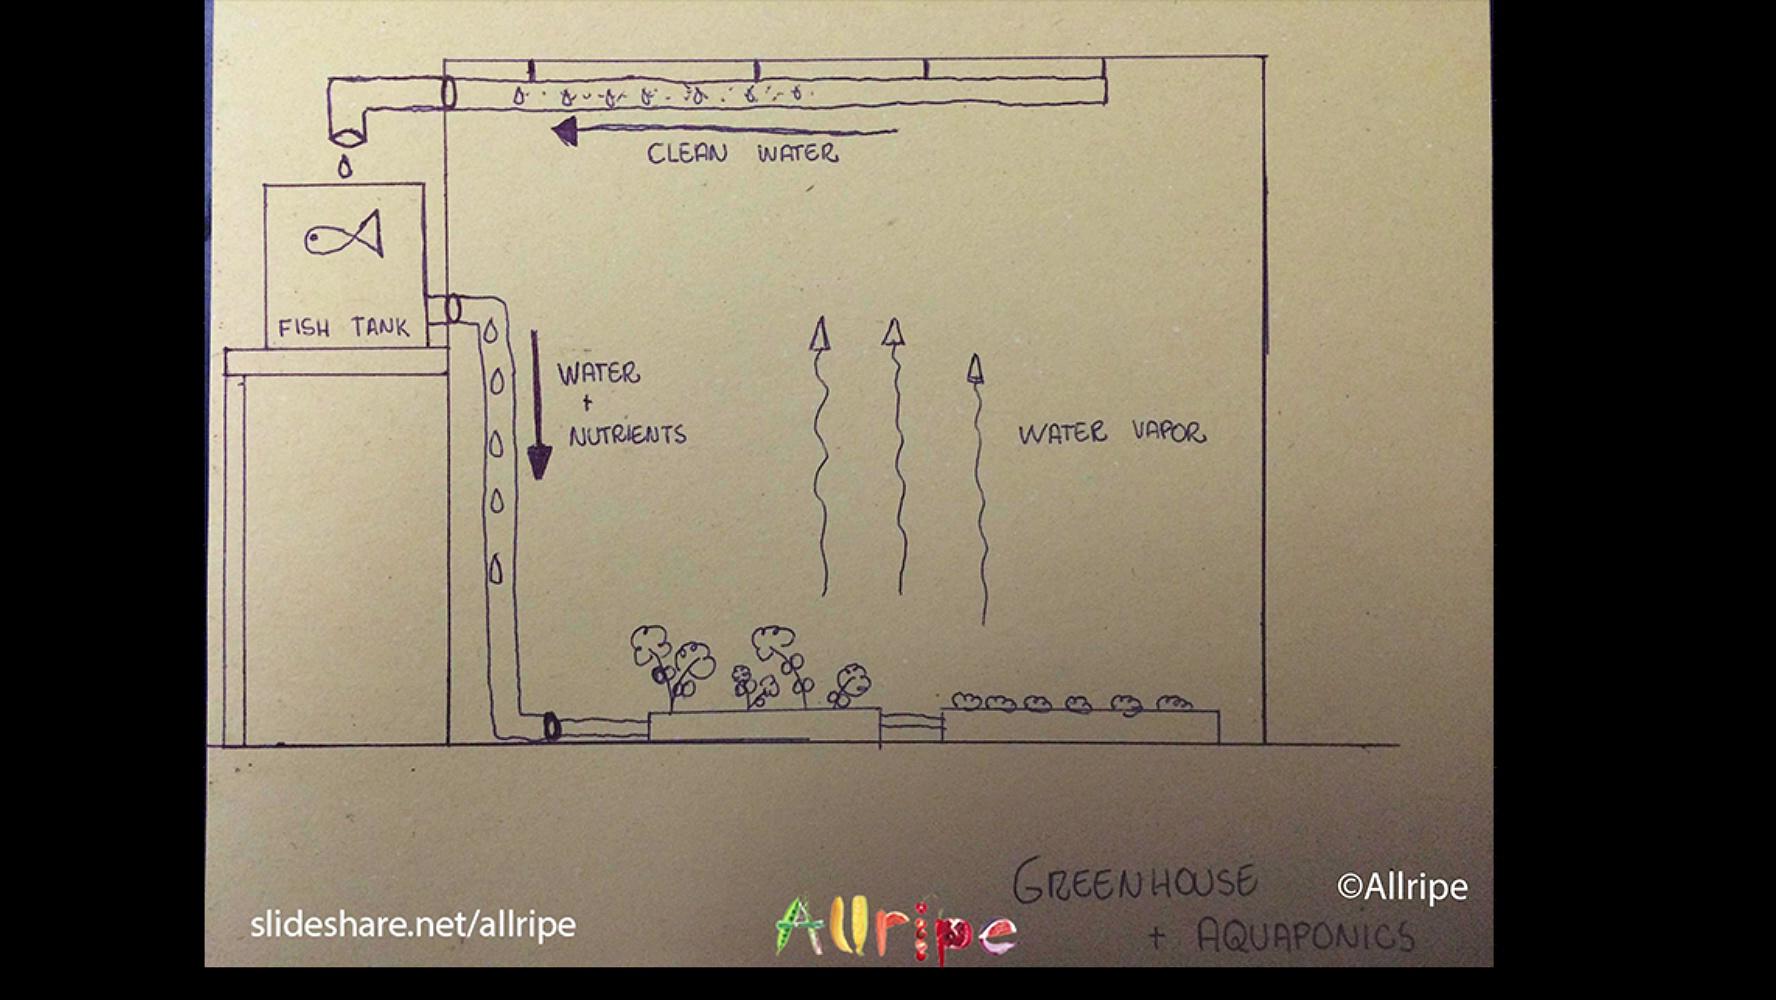 How can the aquaponics greenhouse work?